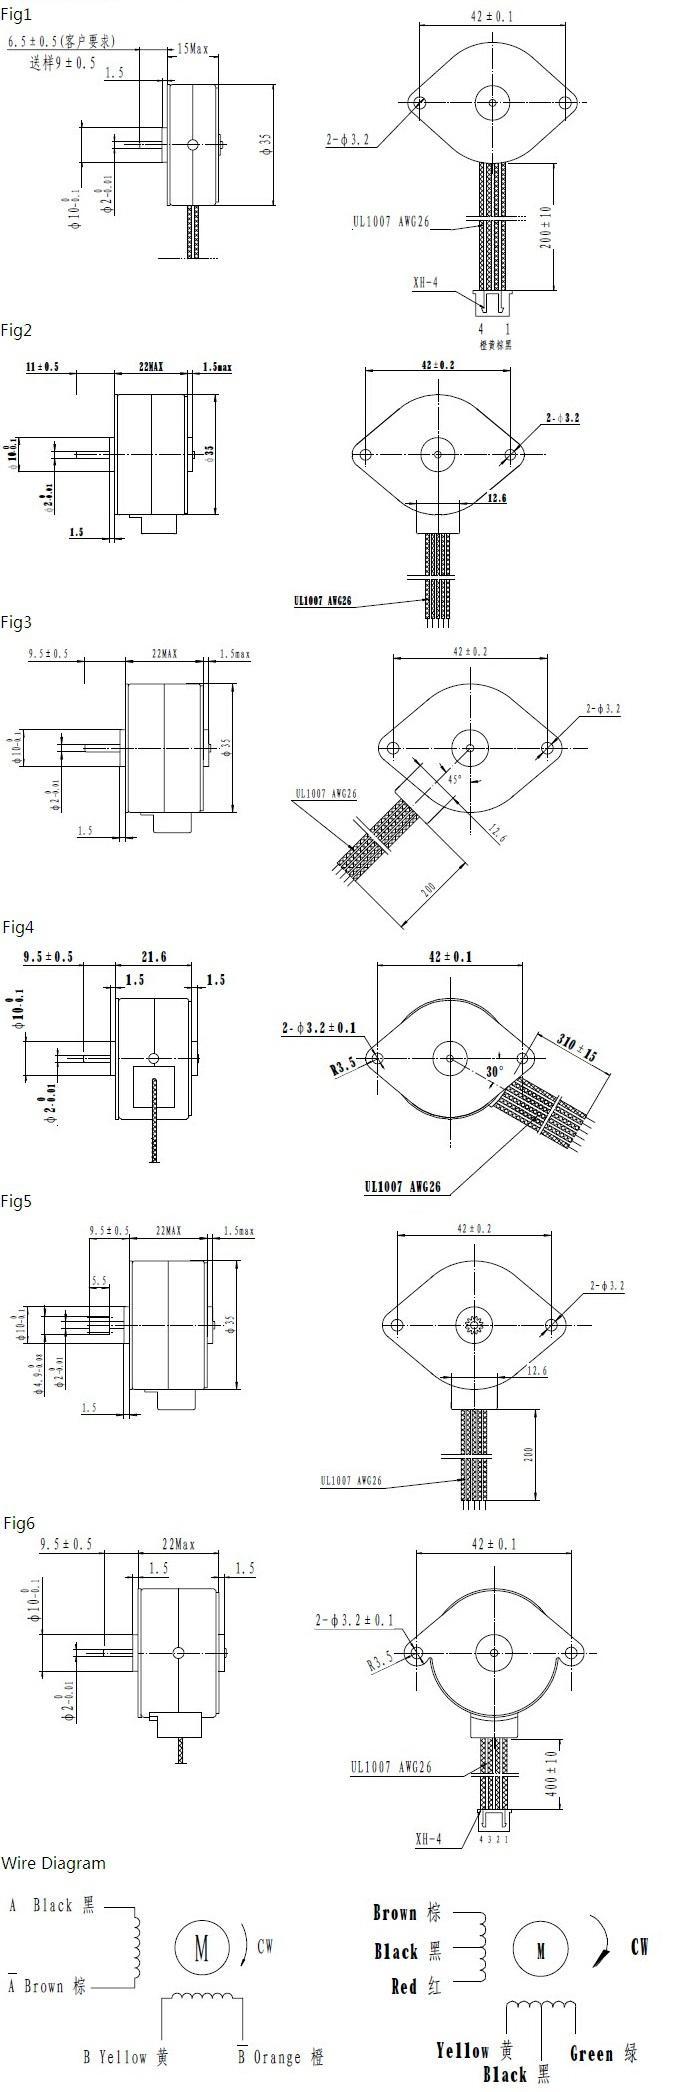 medium resolution of 92 sportster wiring diagram 92 free engine image for harley sportster carburetor motorcycle fuel line